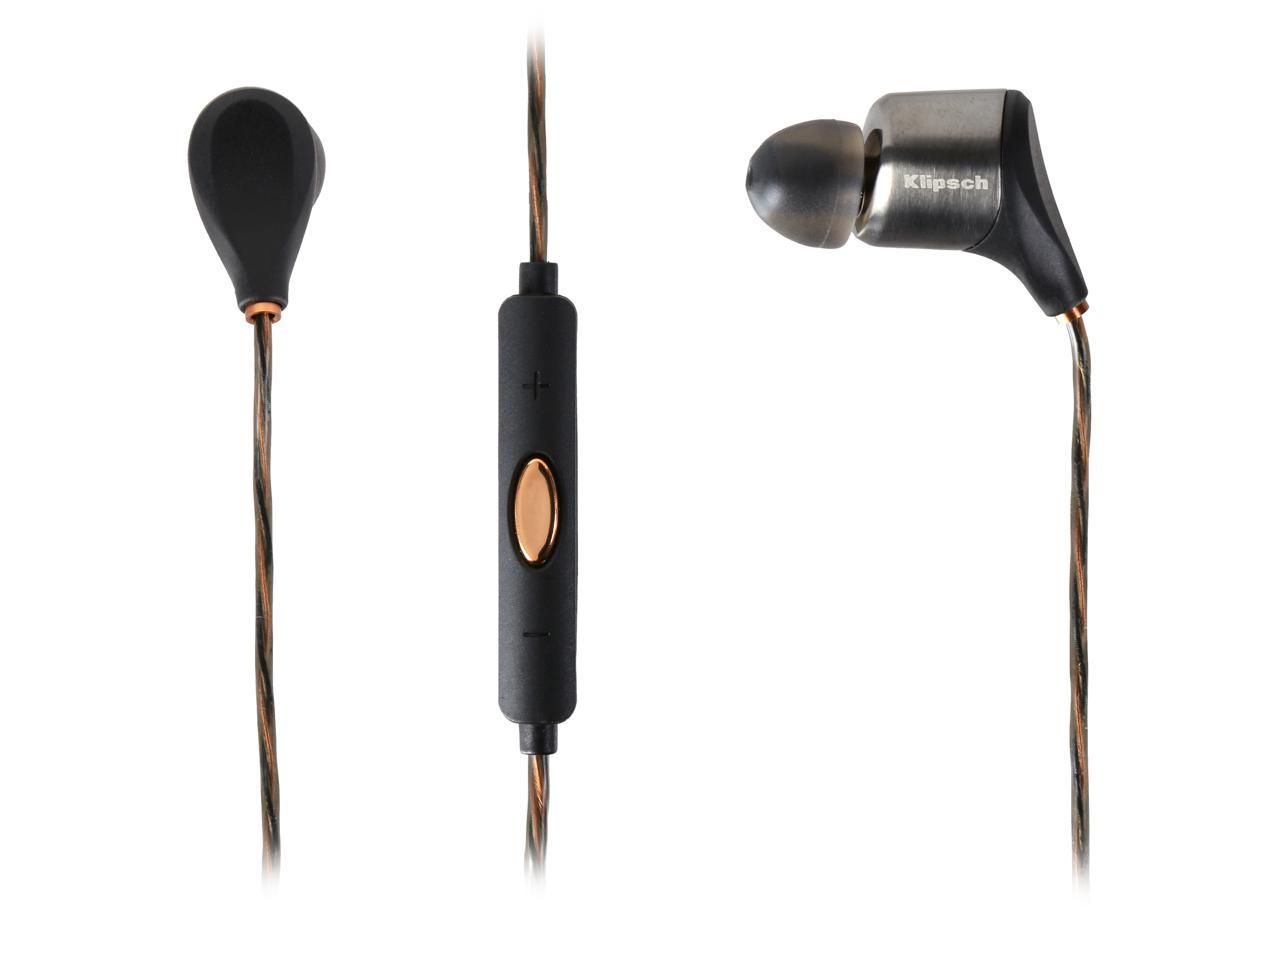 Klipsch XR8i In Ear Headphones - $118 AC @ Newegg (Shell Shocker)